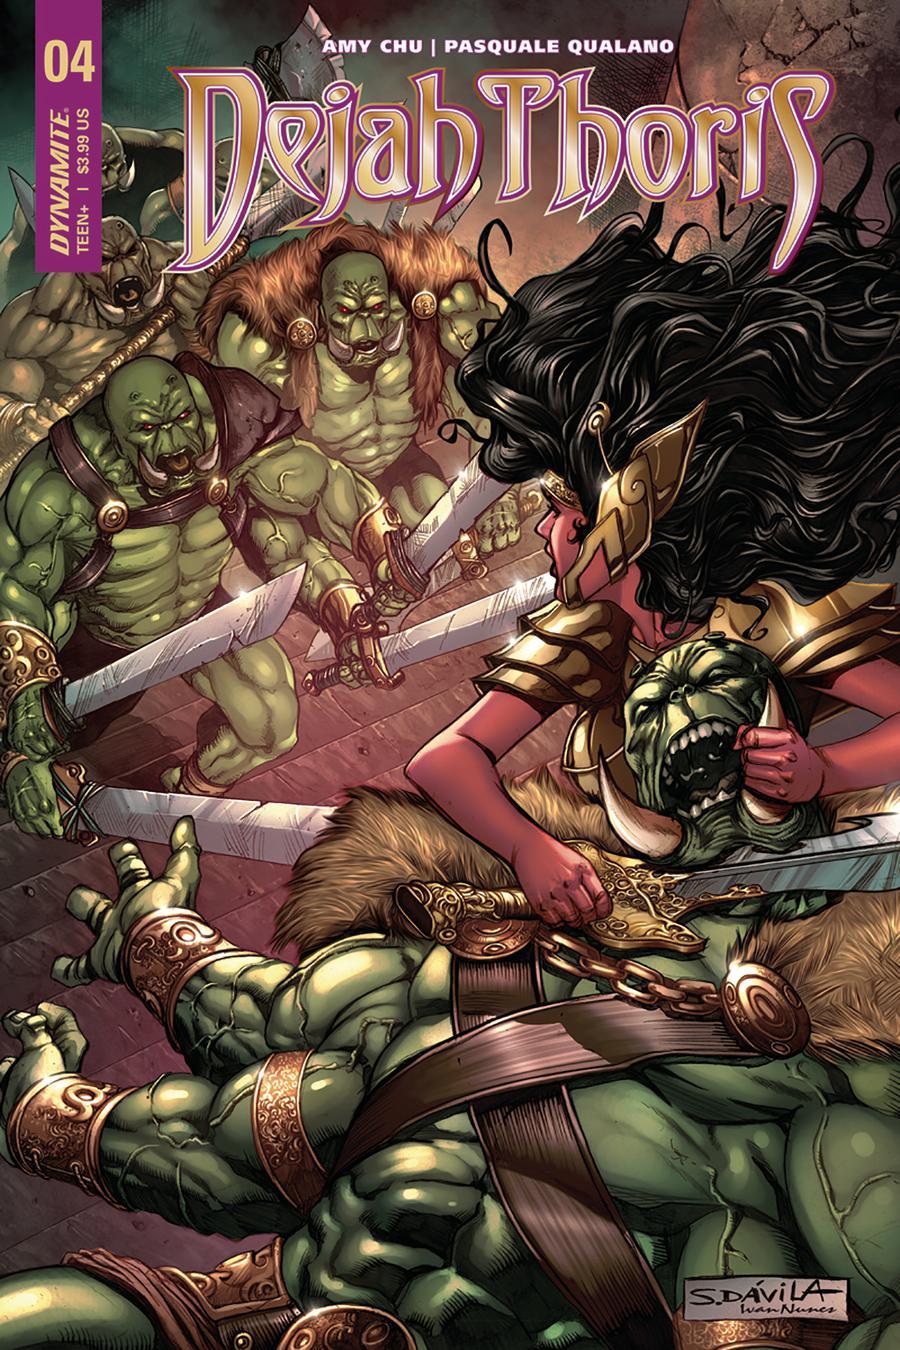 Dejah Thoris Vol 2 #4 Cover C Variant Sergio Davila Cover